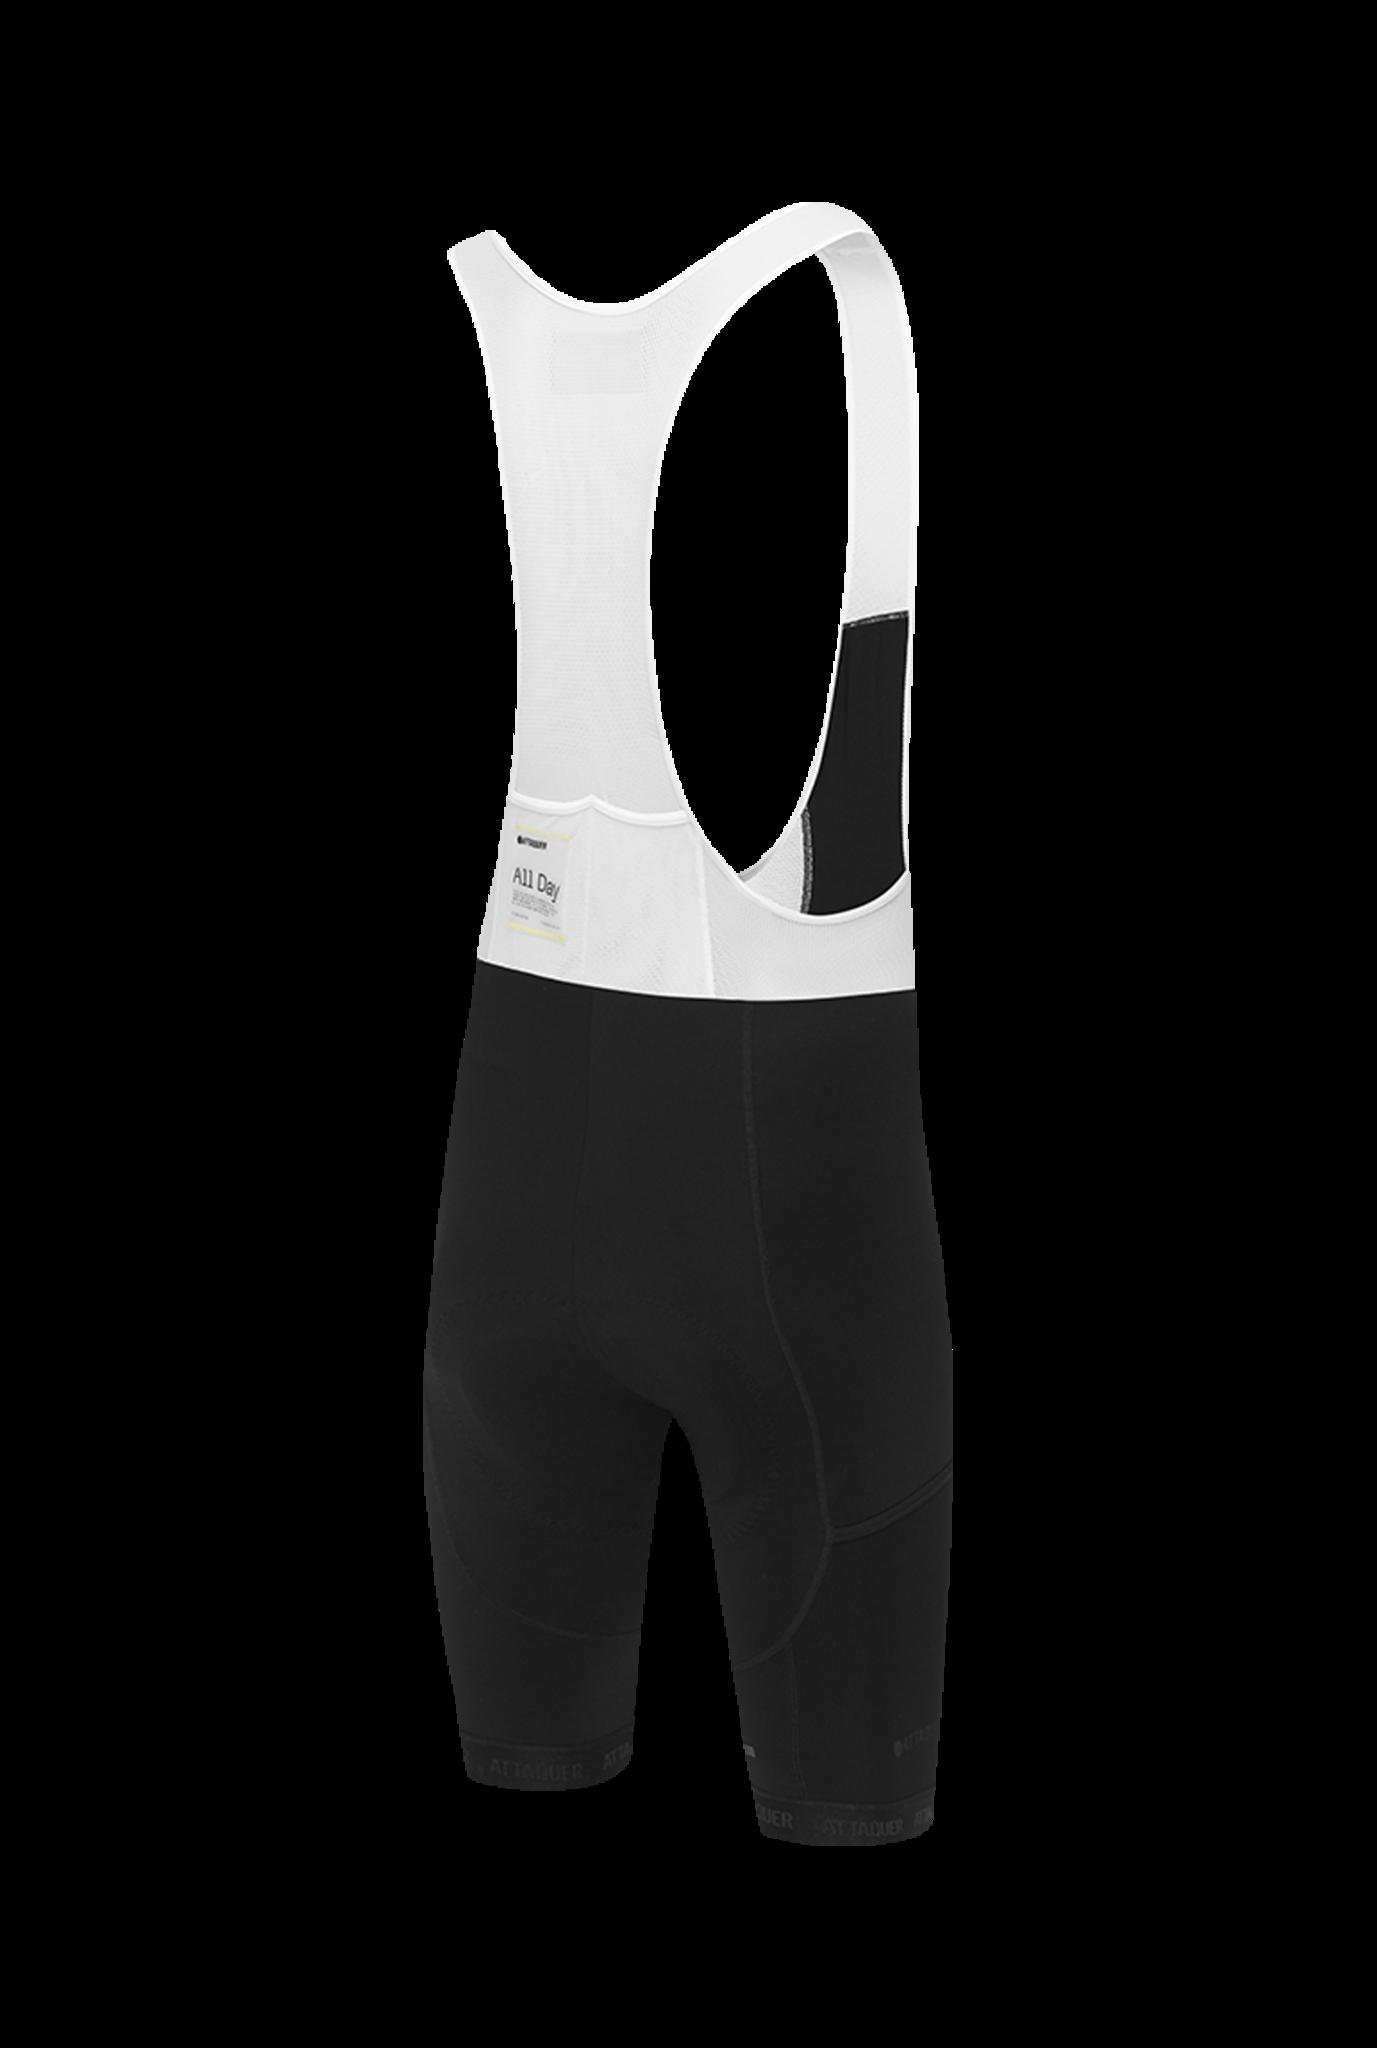 Adventure Bib Short Black Reflective White Logo-2